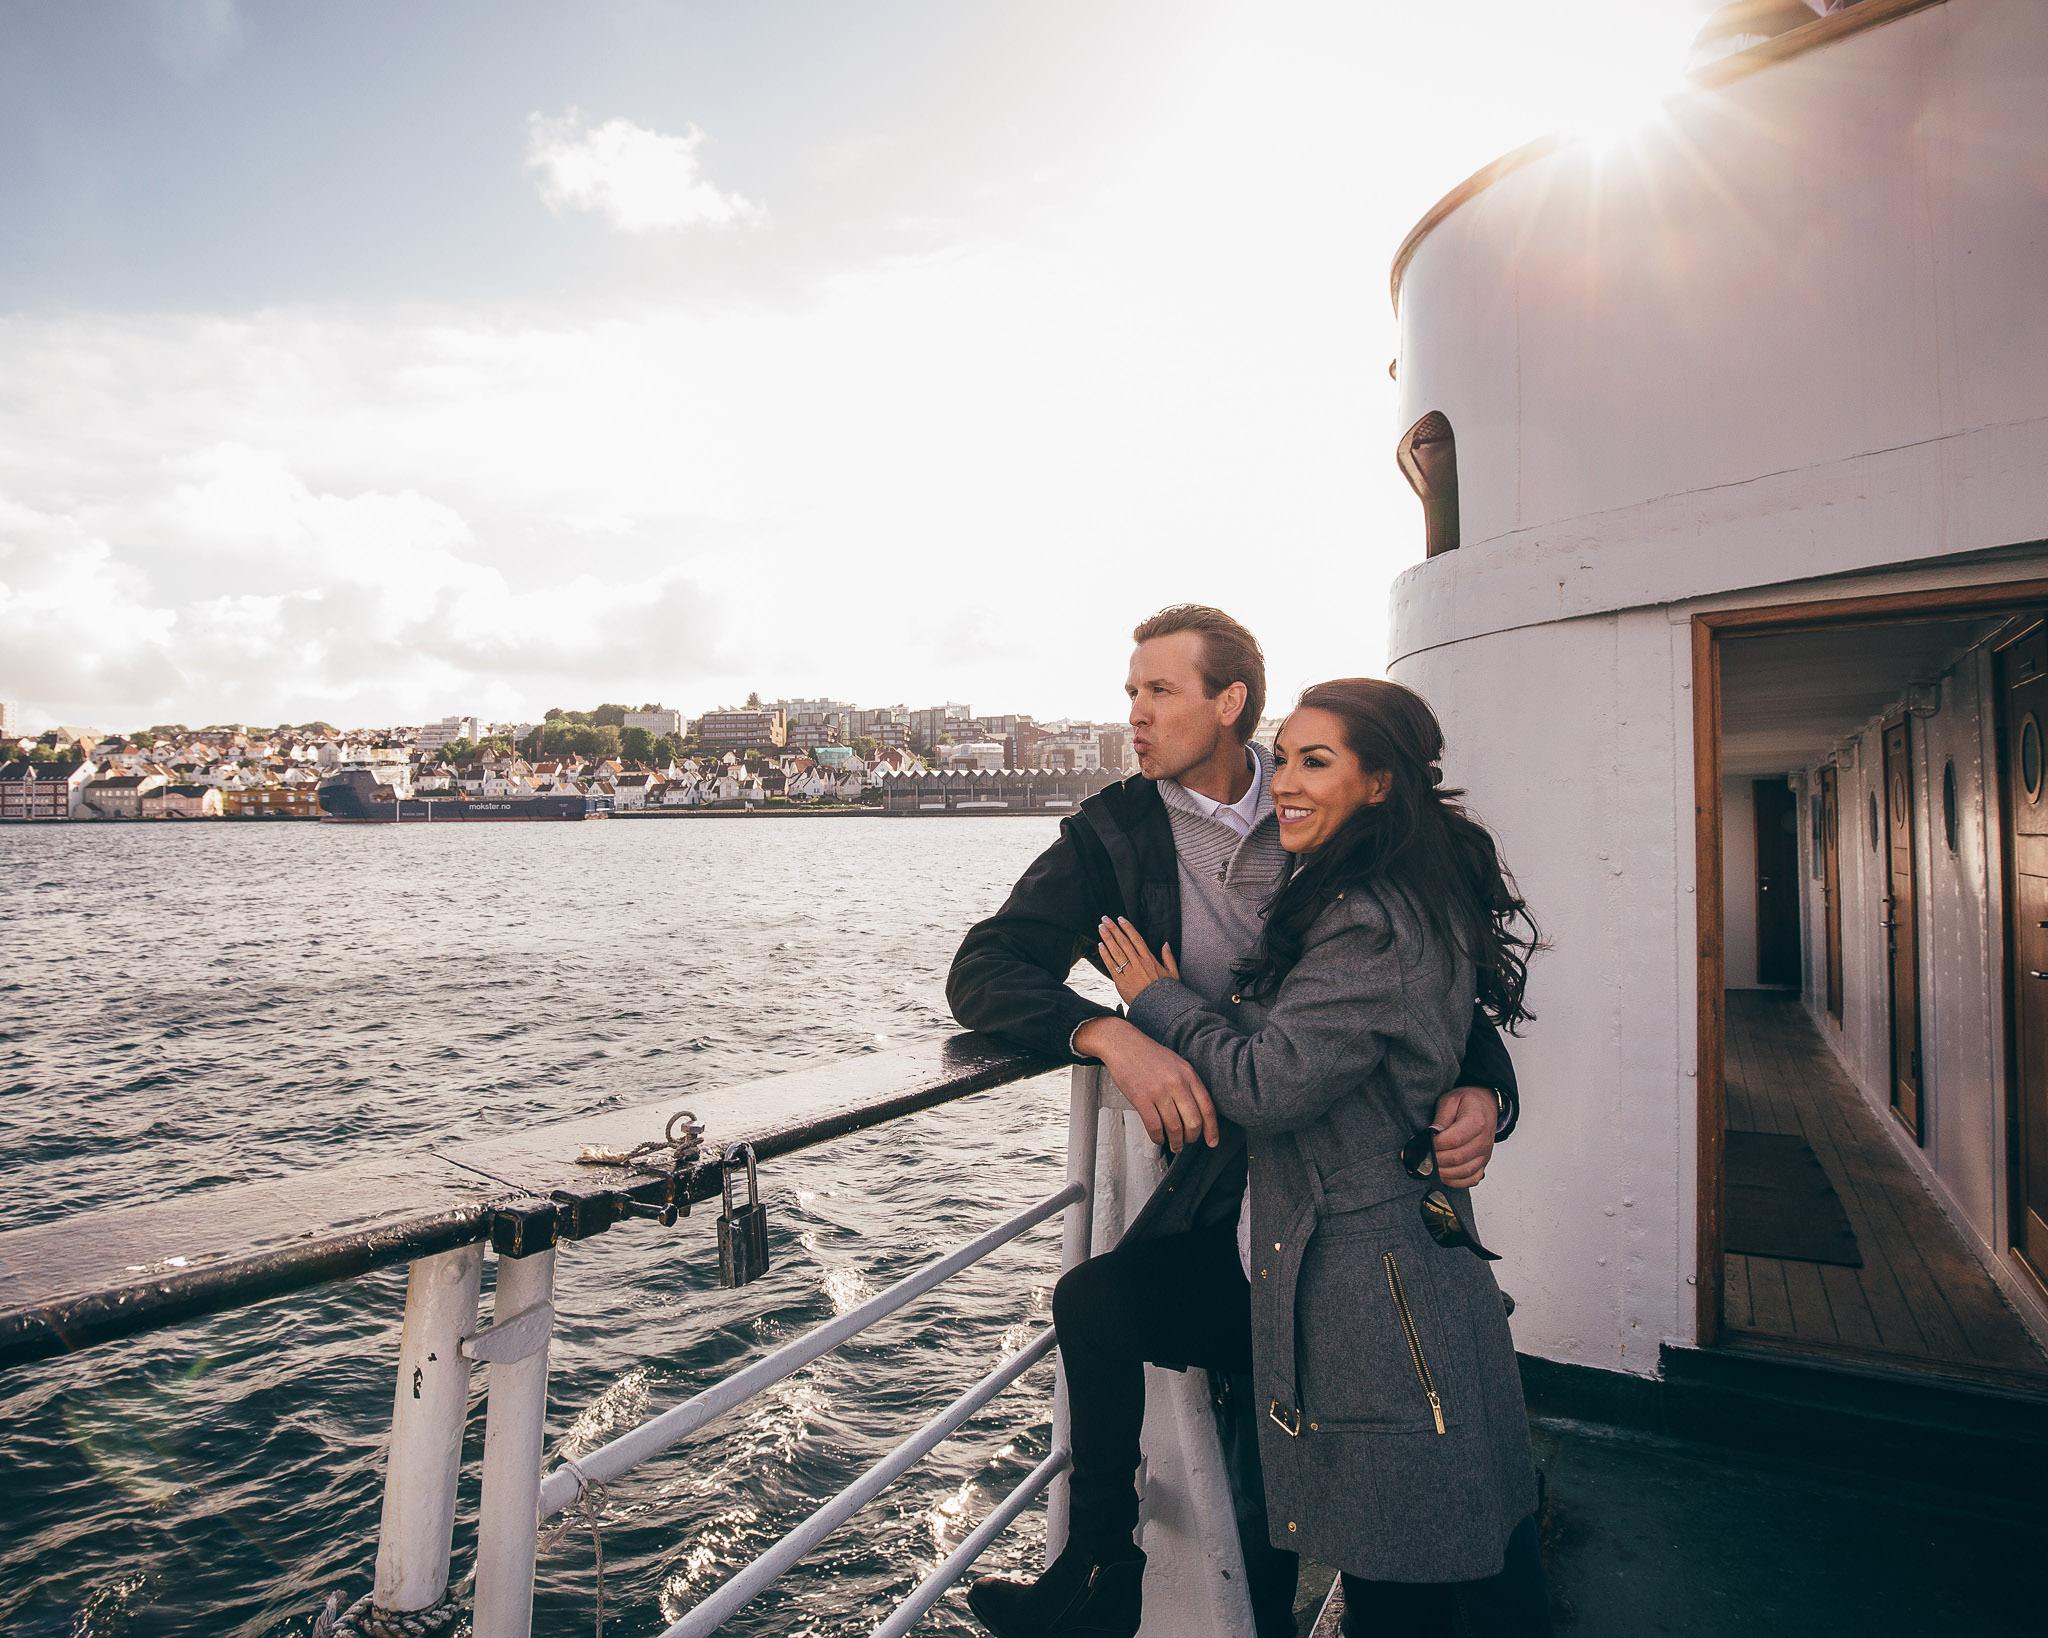 Wedding+Photographer+Norway+Bryllupsfotograf+Casey+Arneson+MK-27.jpg